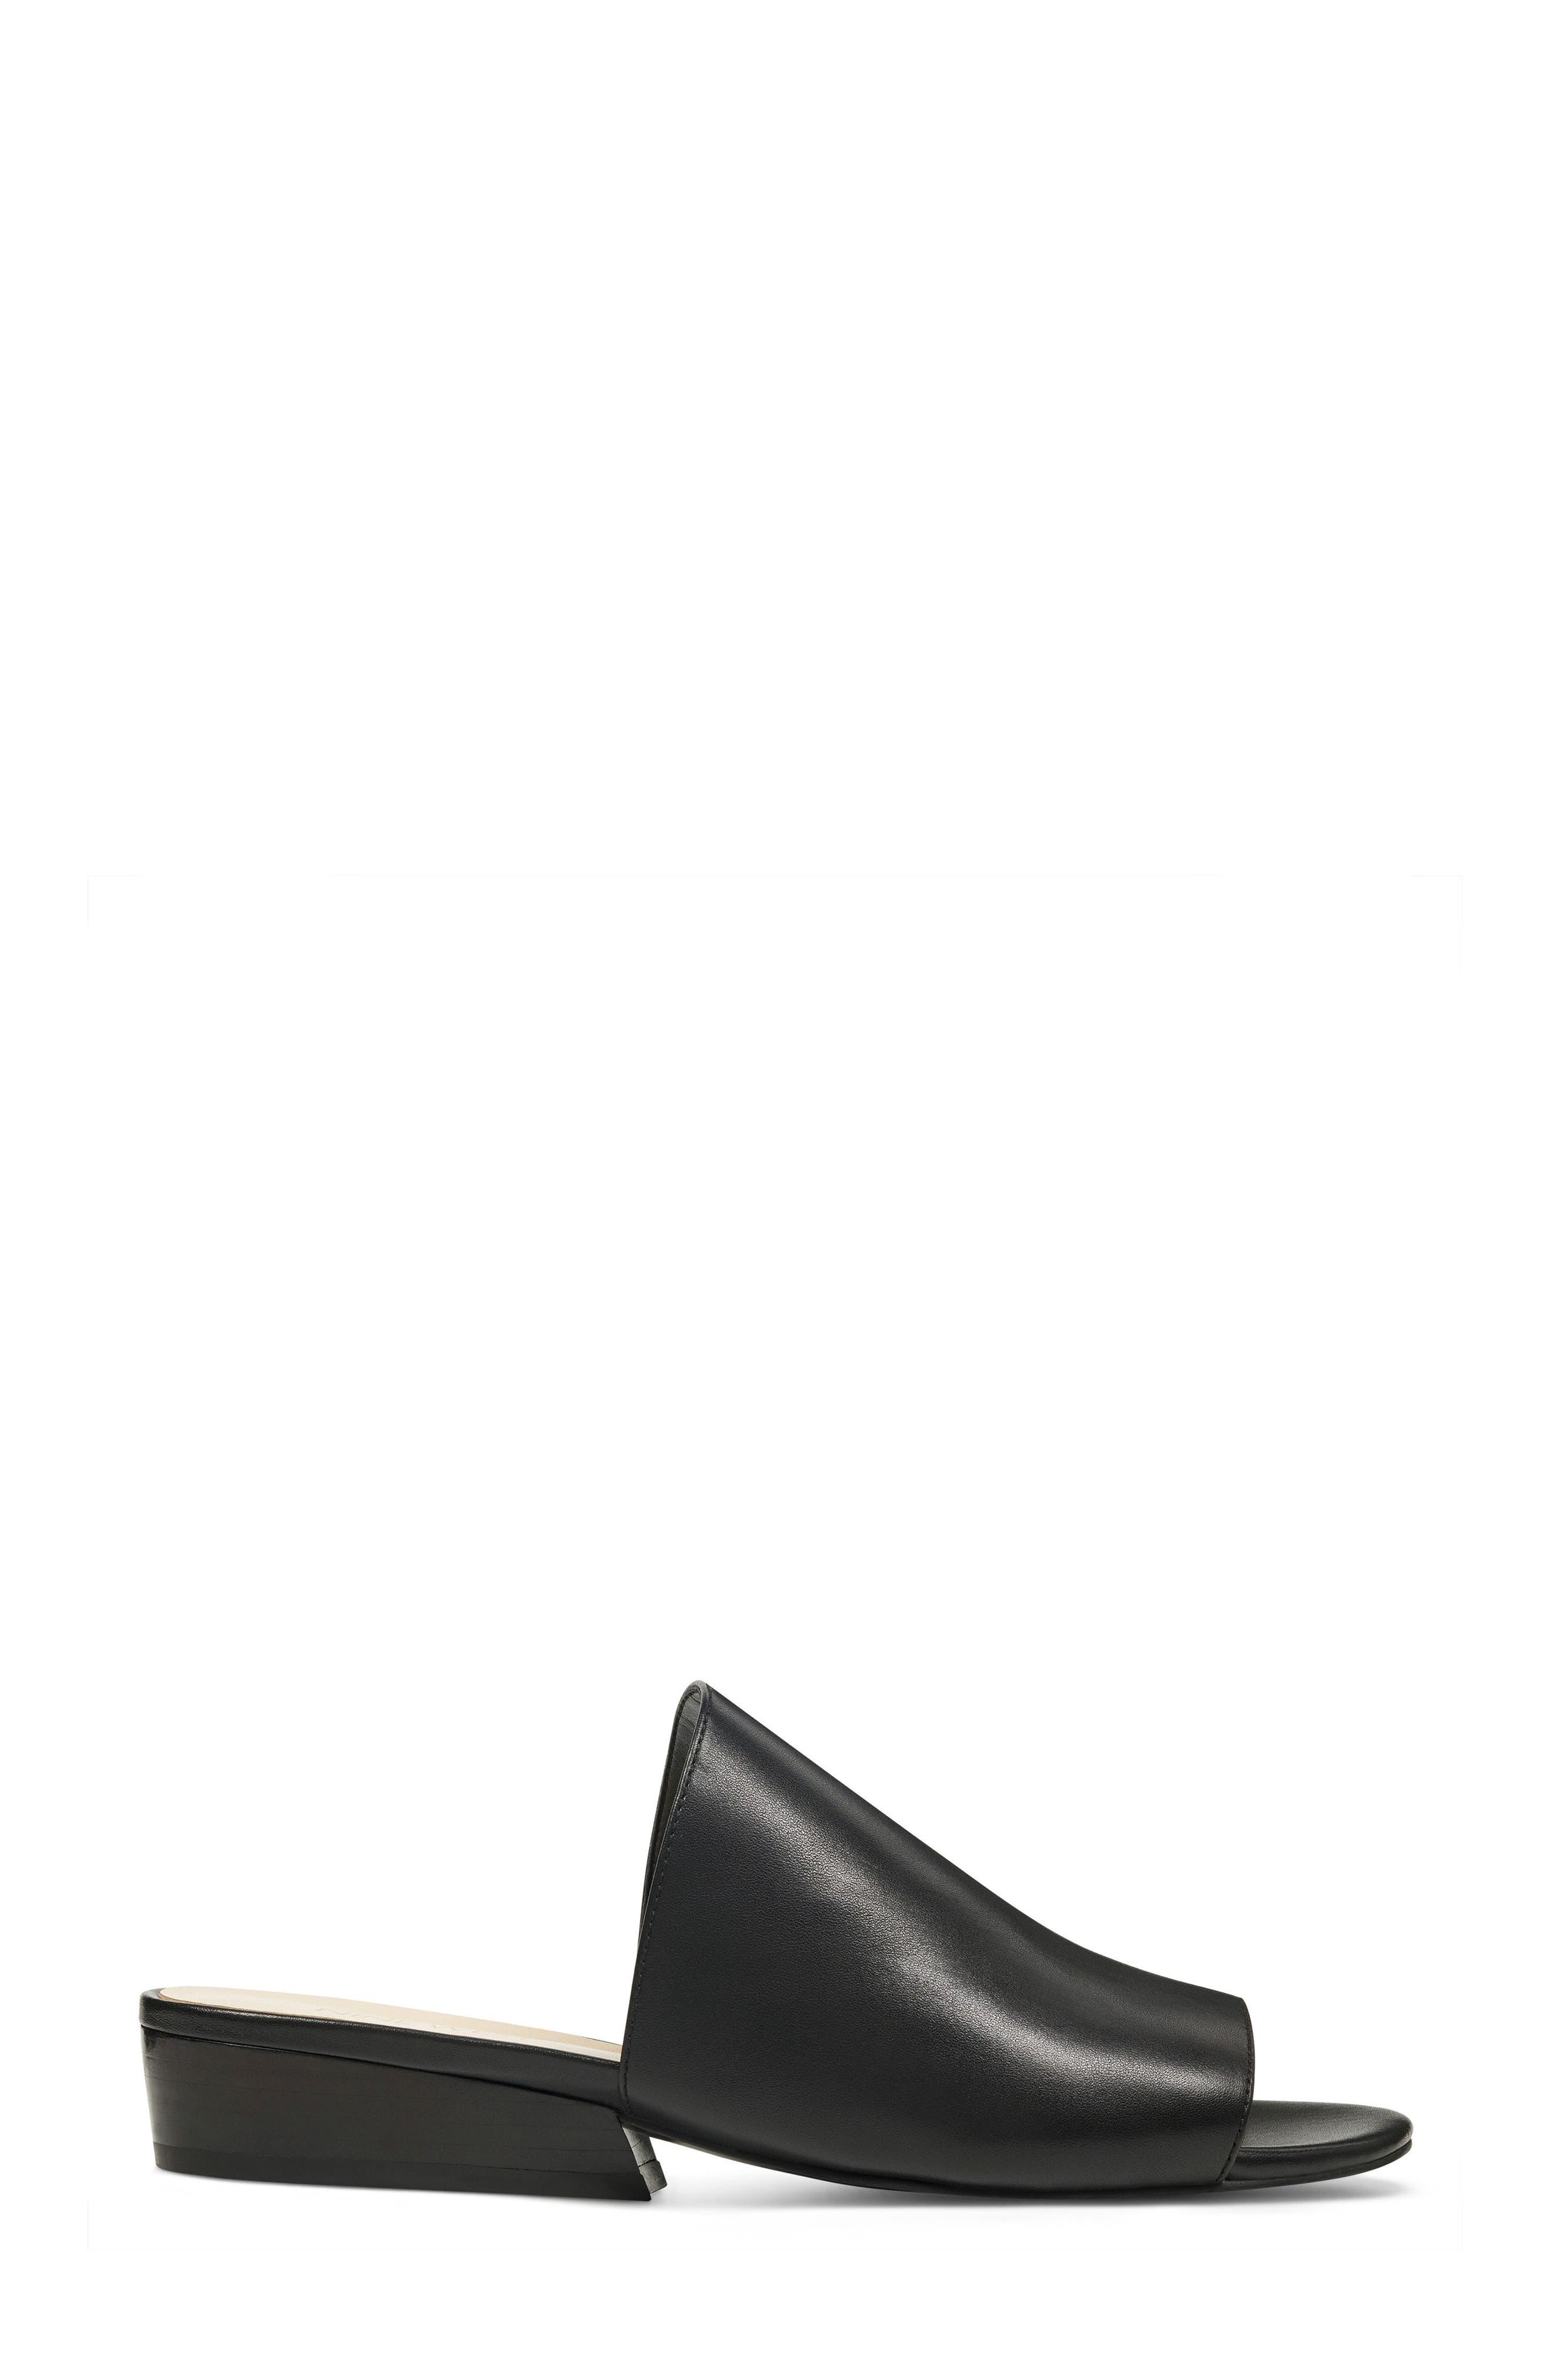 Lynneah Sandal,                             Alternate thumbnail 3, color,                             Black Leather